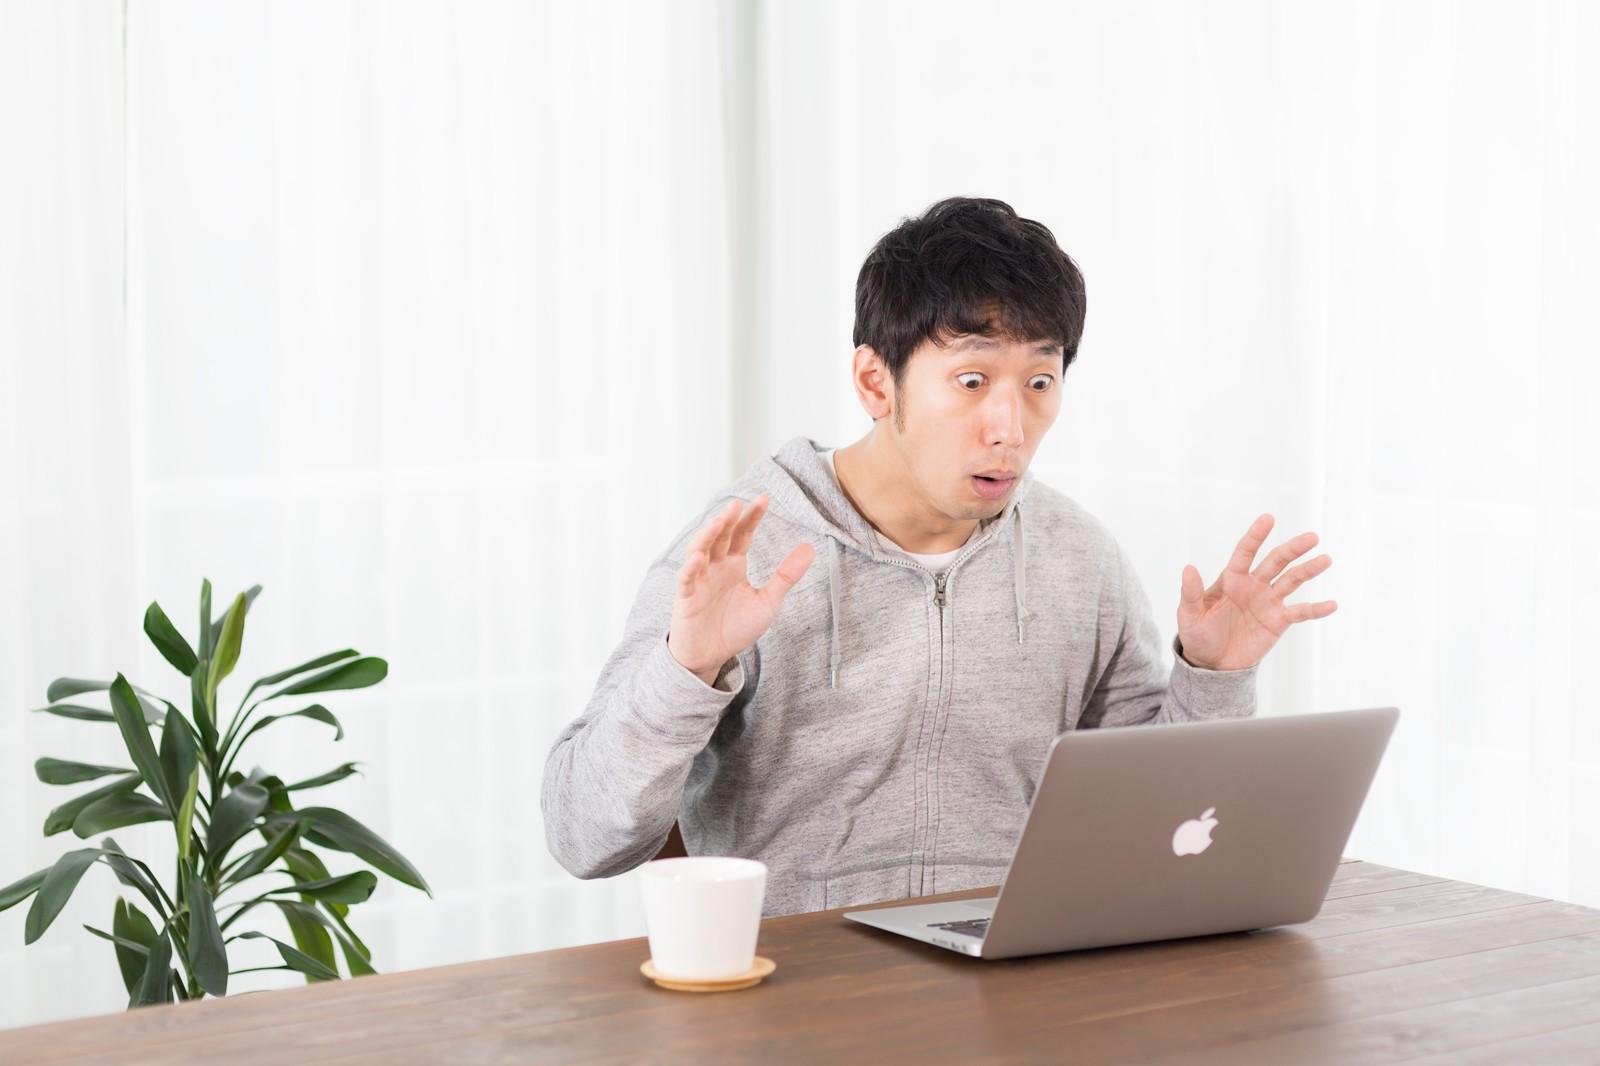 Wikipediaの日本一長い記事はなんと…面白い結果に大爆笑